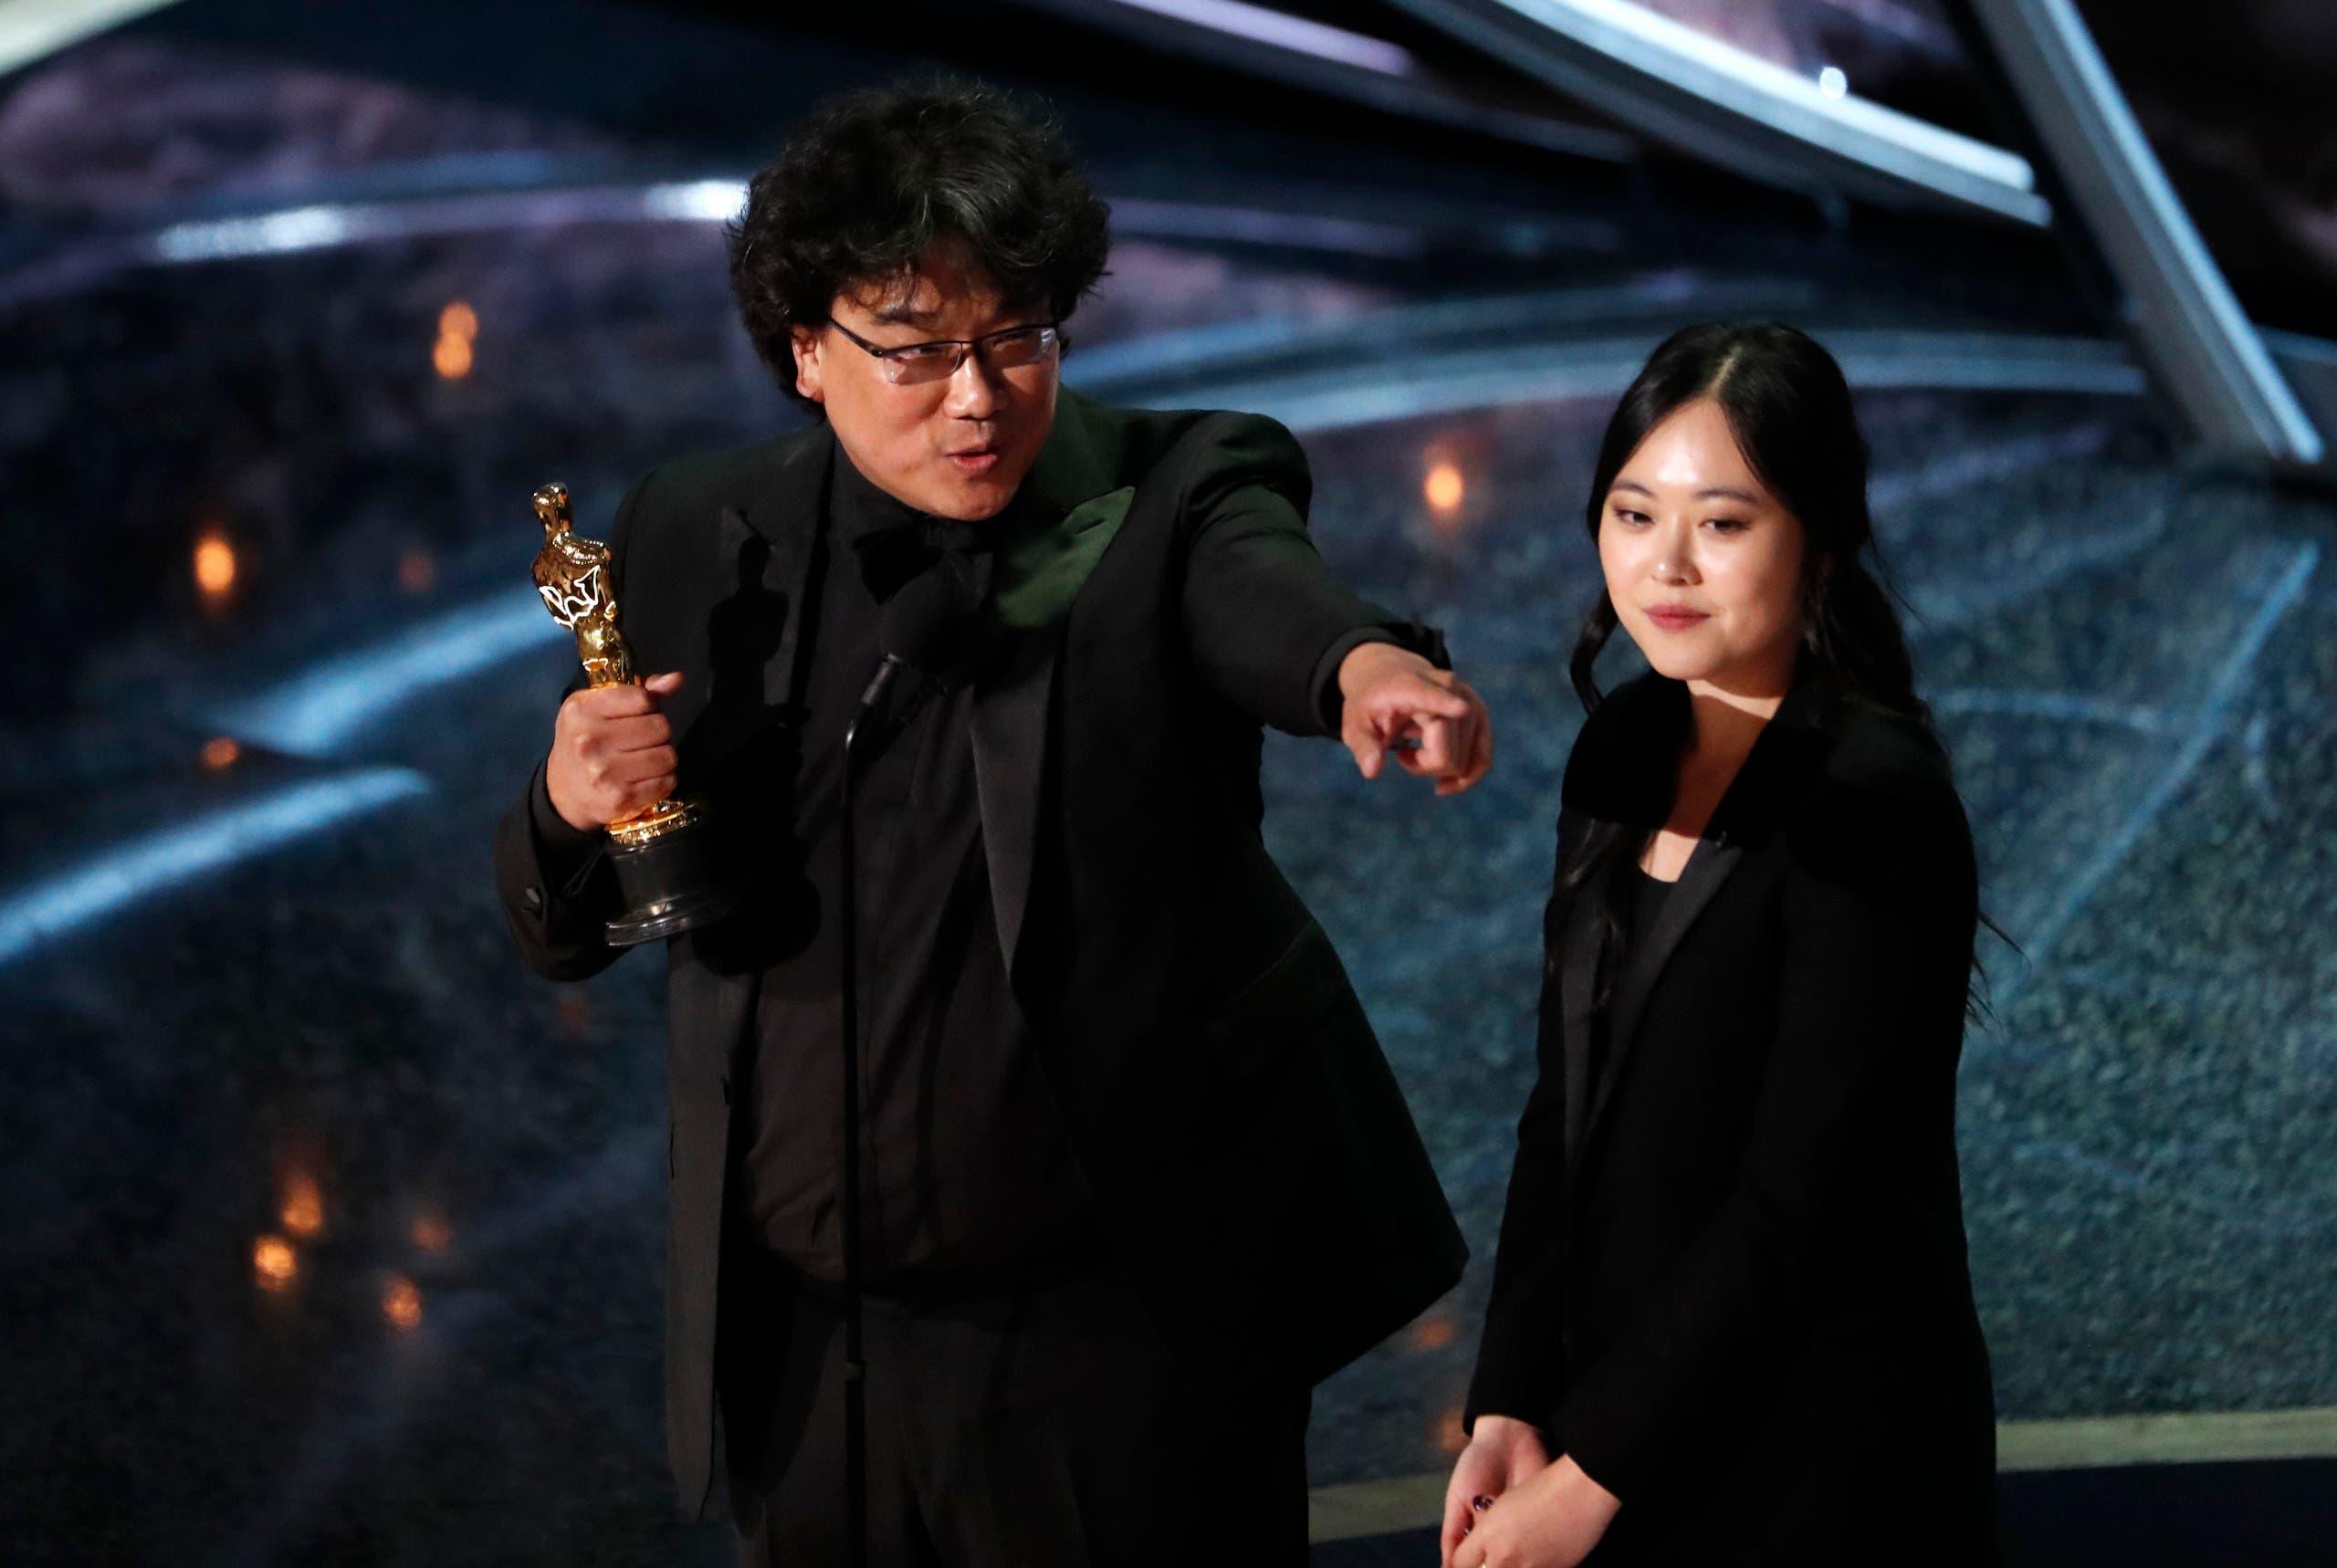 مخرج فيلم بارازايت - بونغ جون هوو